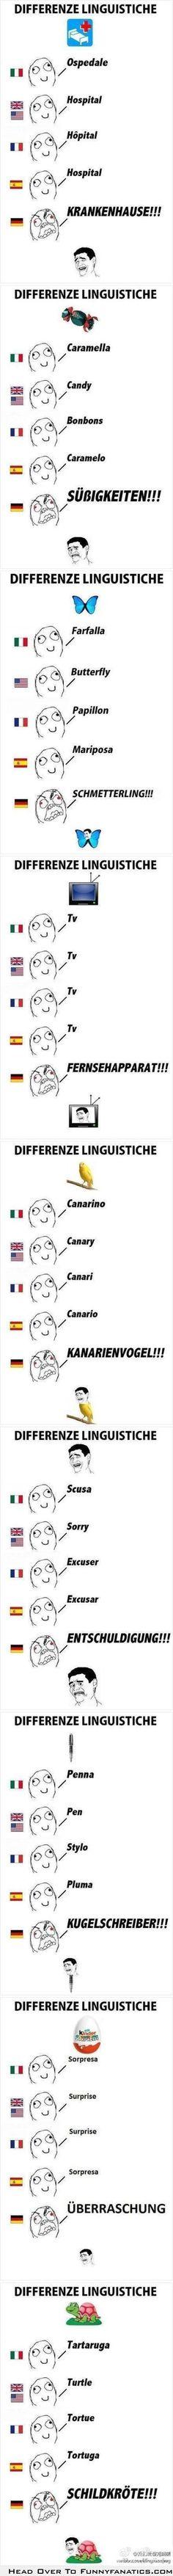 Different languages.